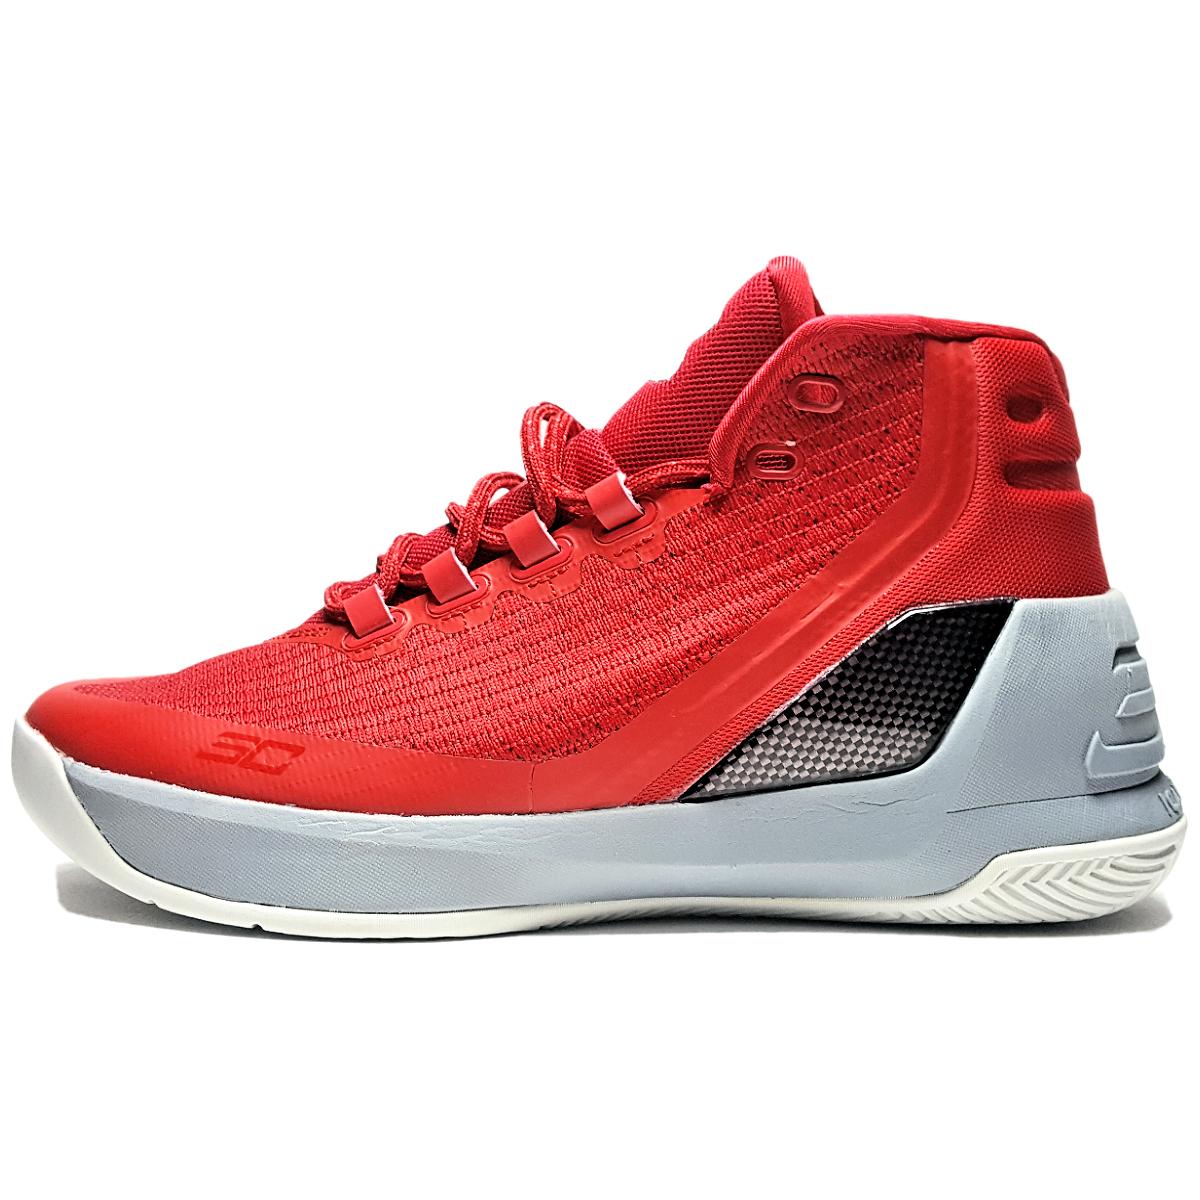 قیمت کفش نیم ساق آندر آرمور مدل Curry 3 Davidson Red